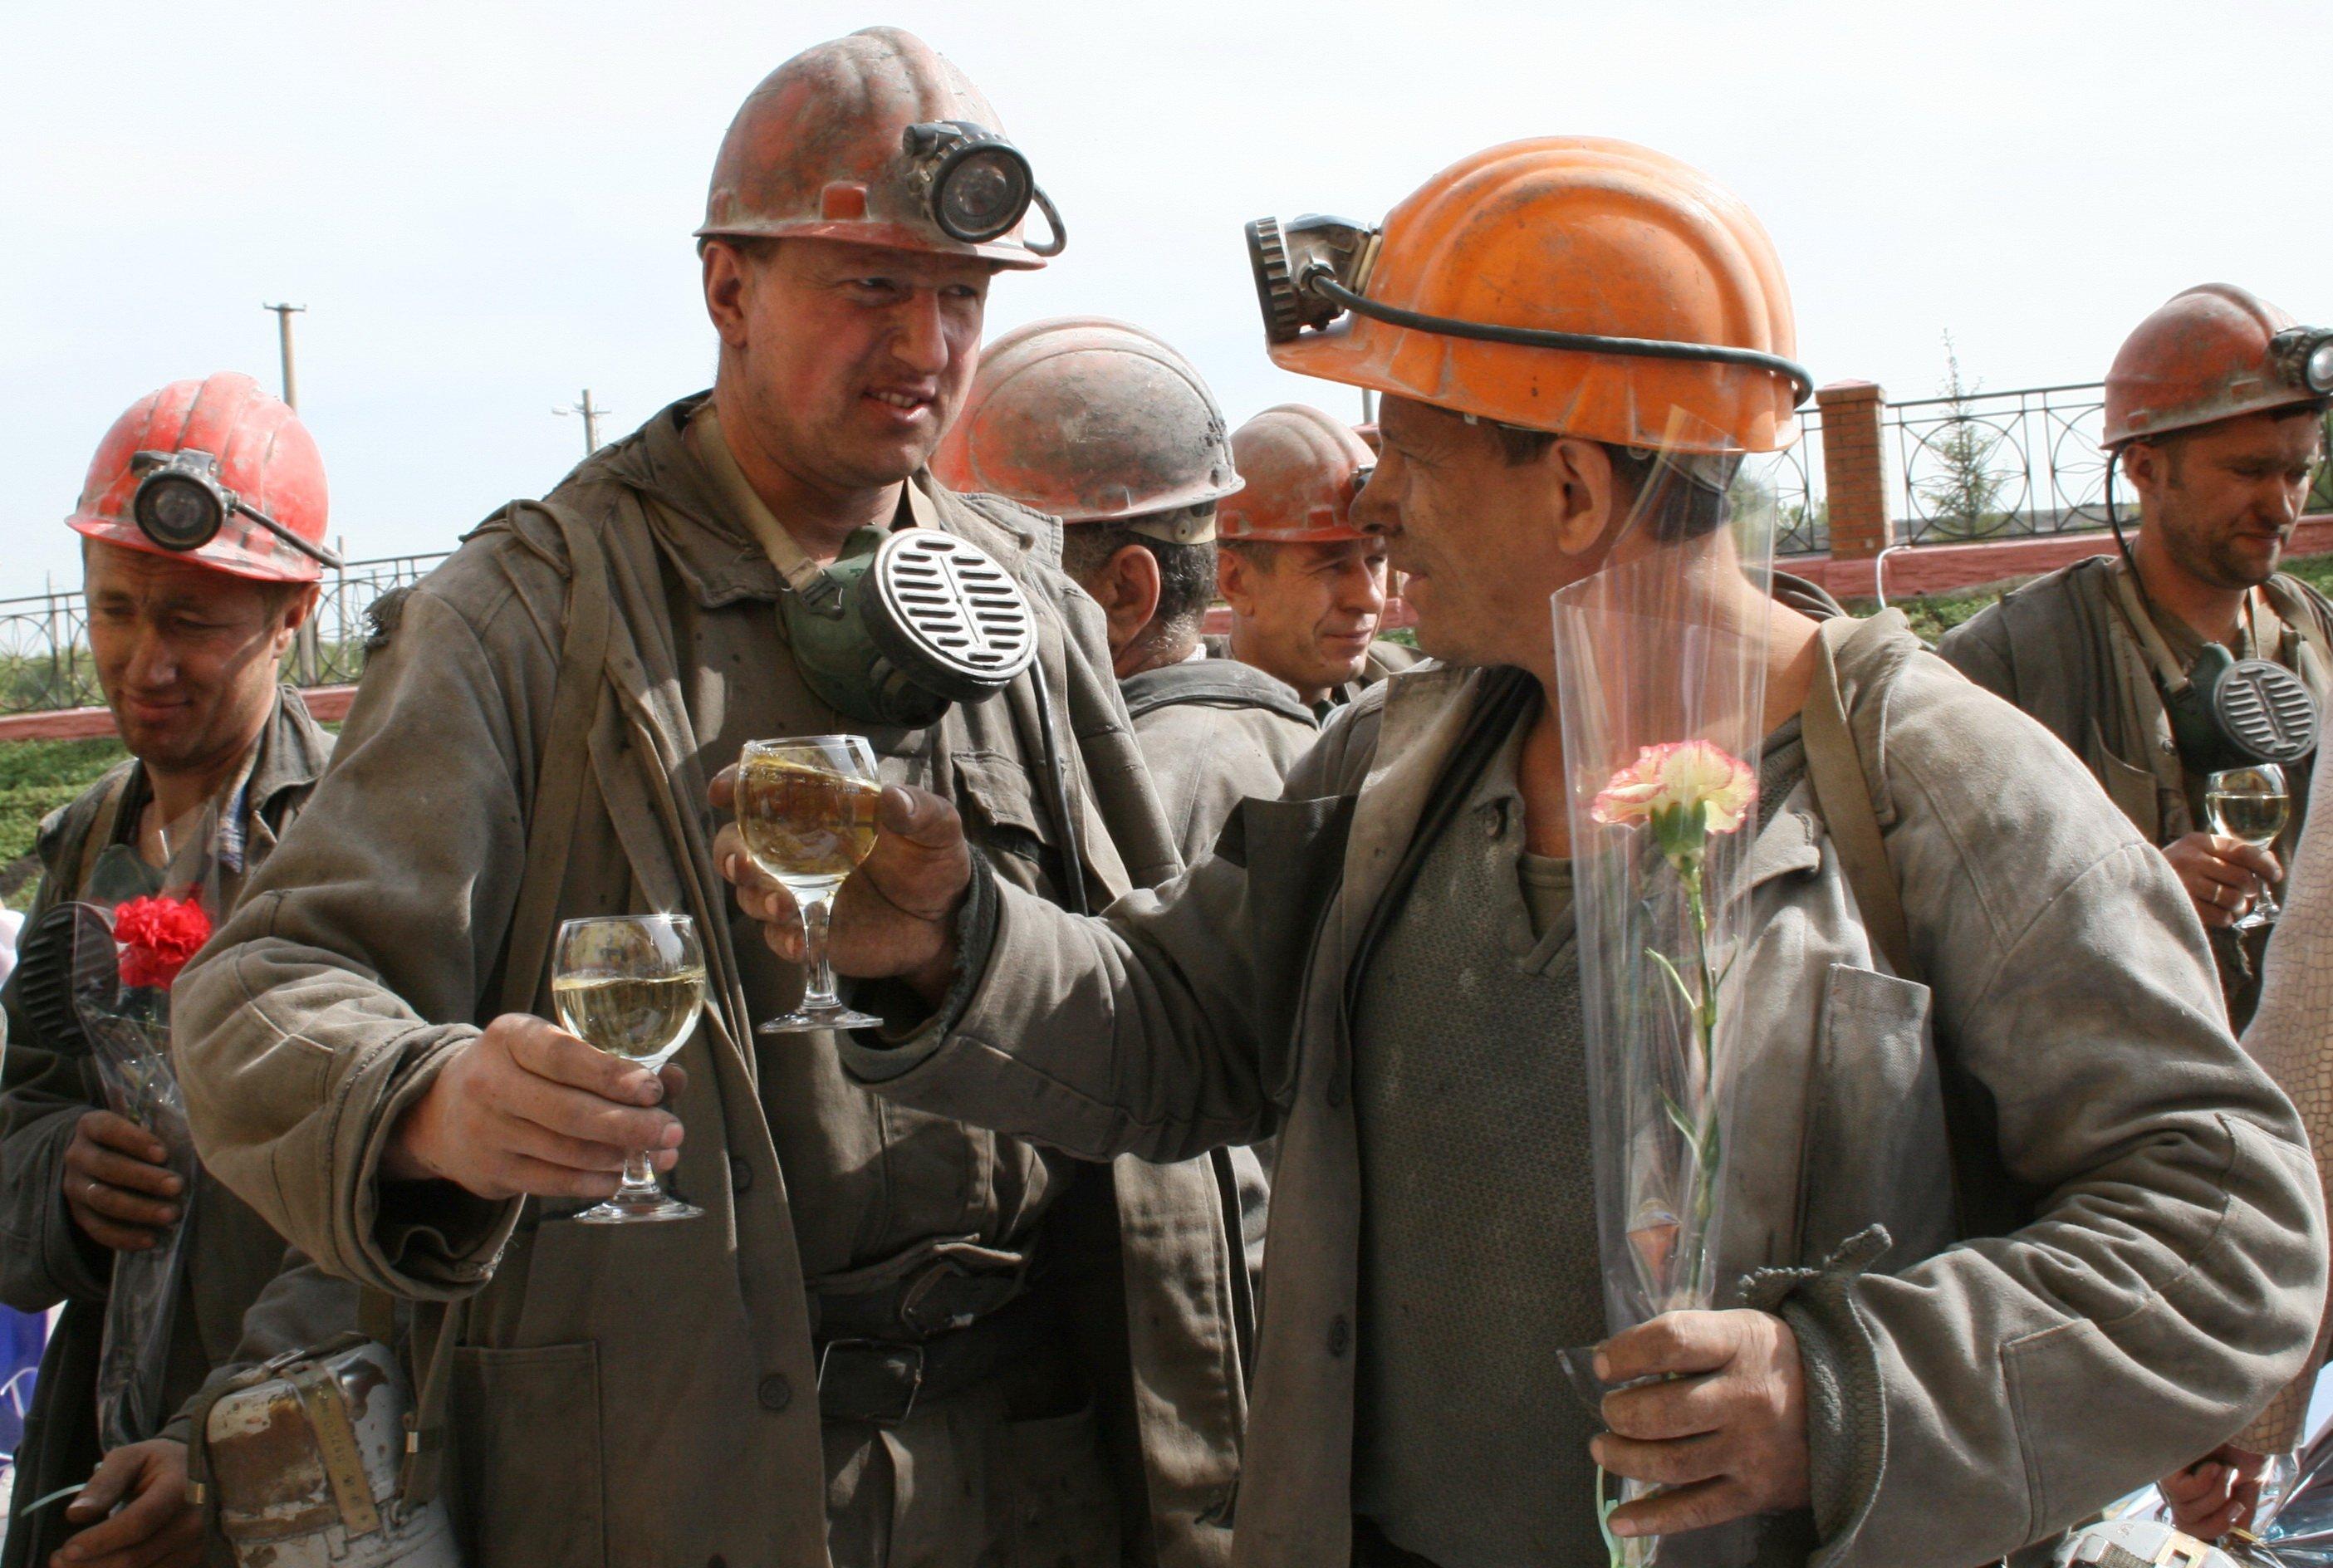 вознесен приколы к дню шахтера фото стосується якості